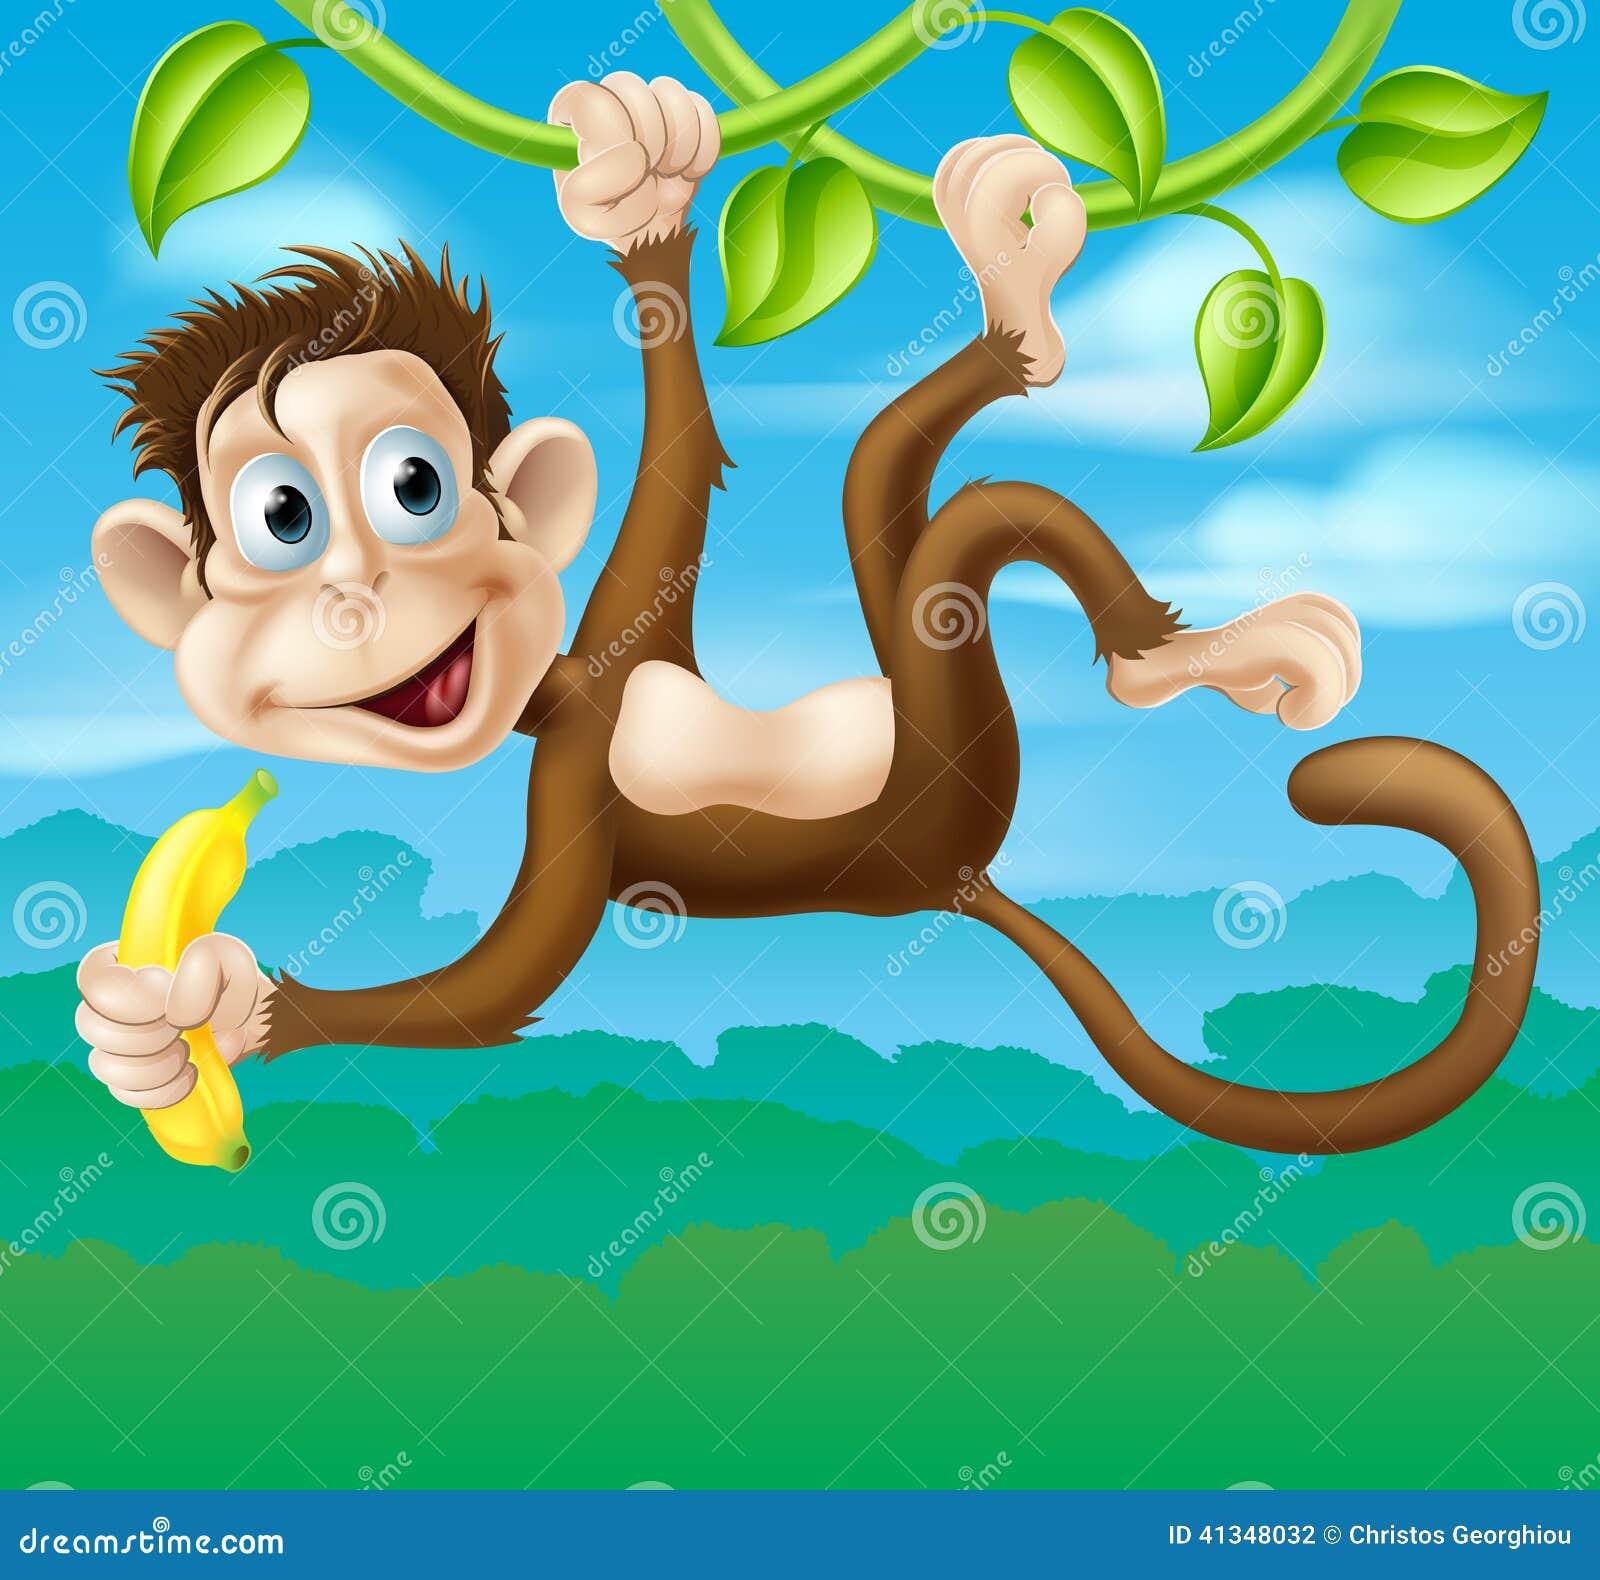 monkey cartoon in jungle swinging on vine stock vector